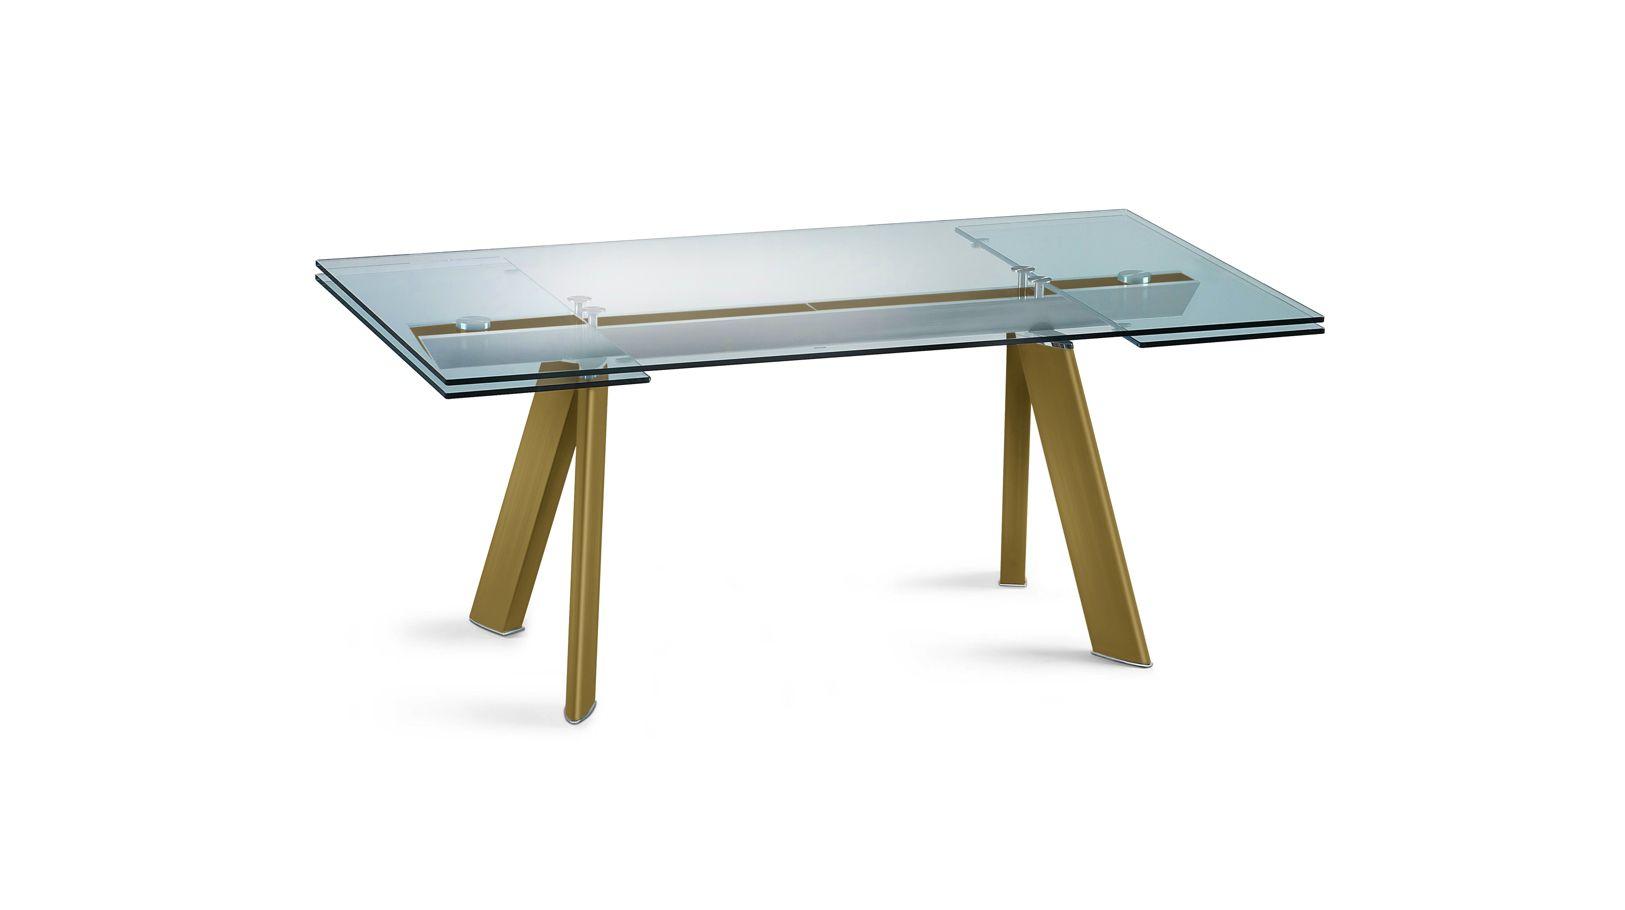 Table de repas chronos anodise roche bobois - Roche et bobois table ...